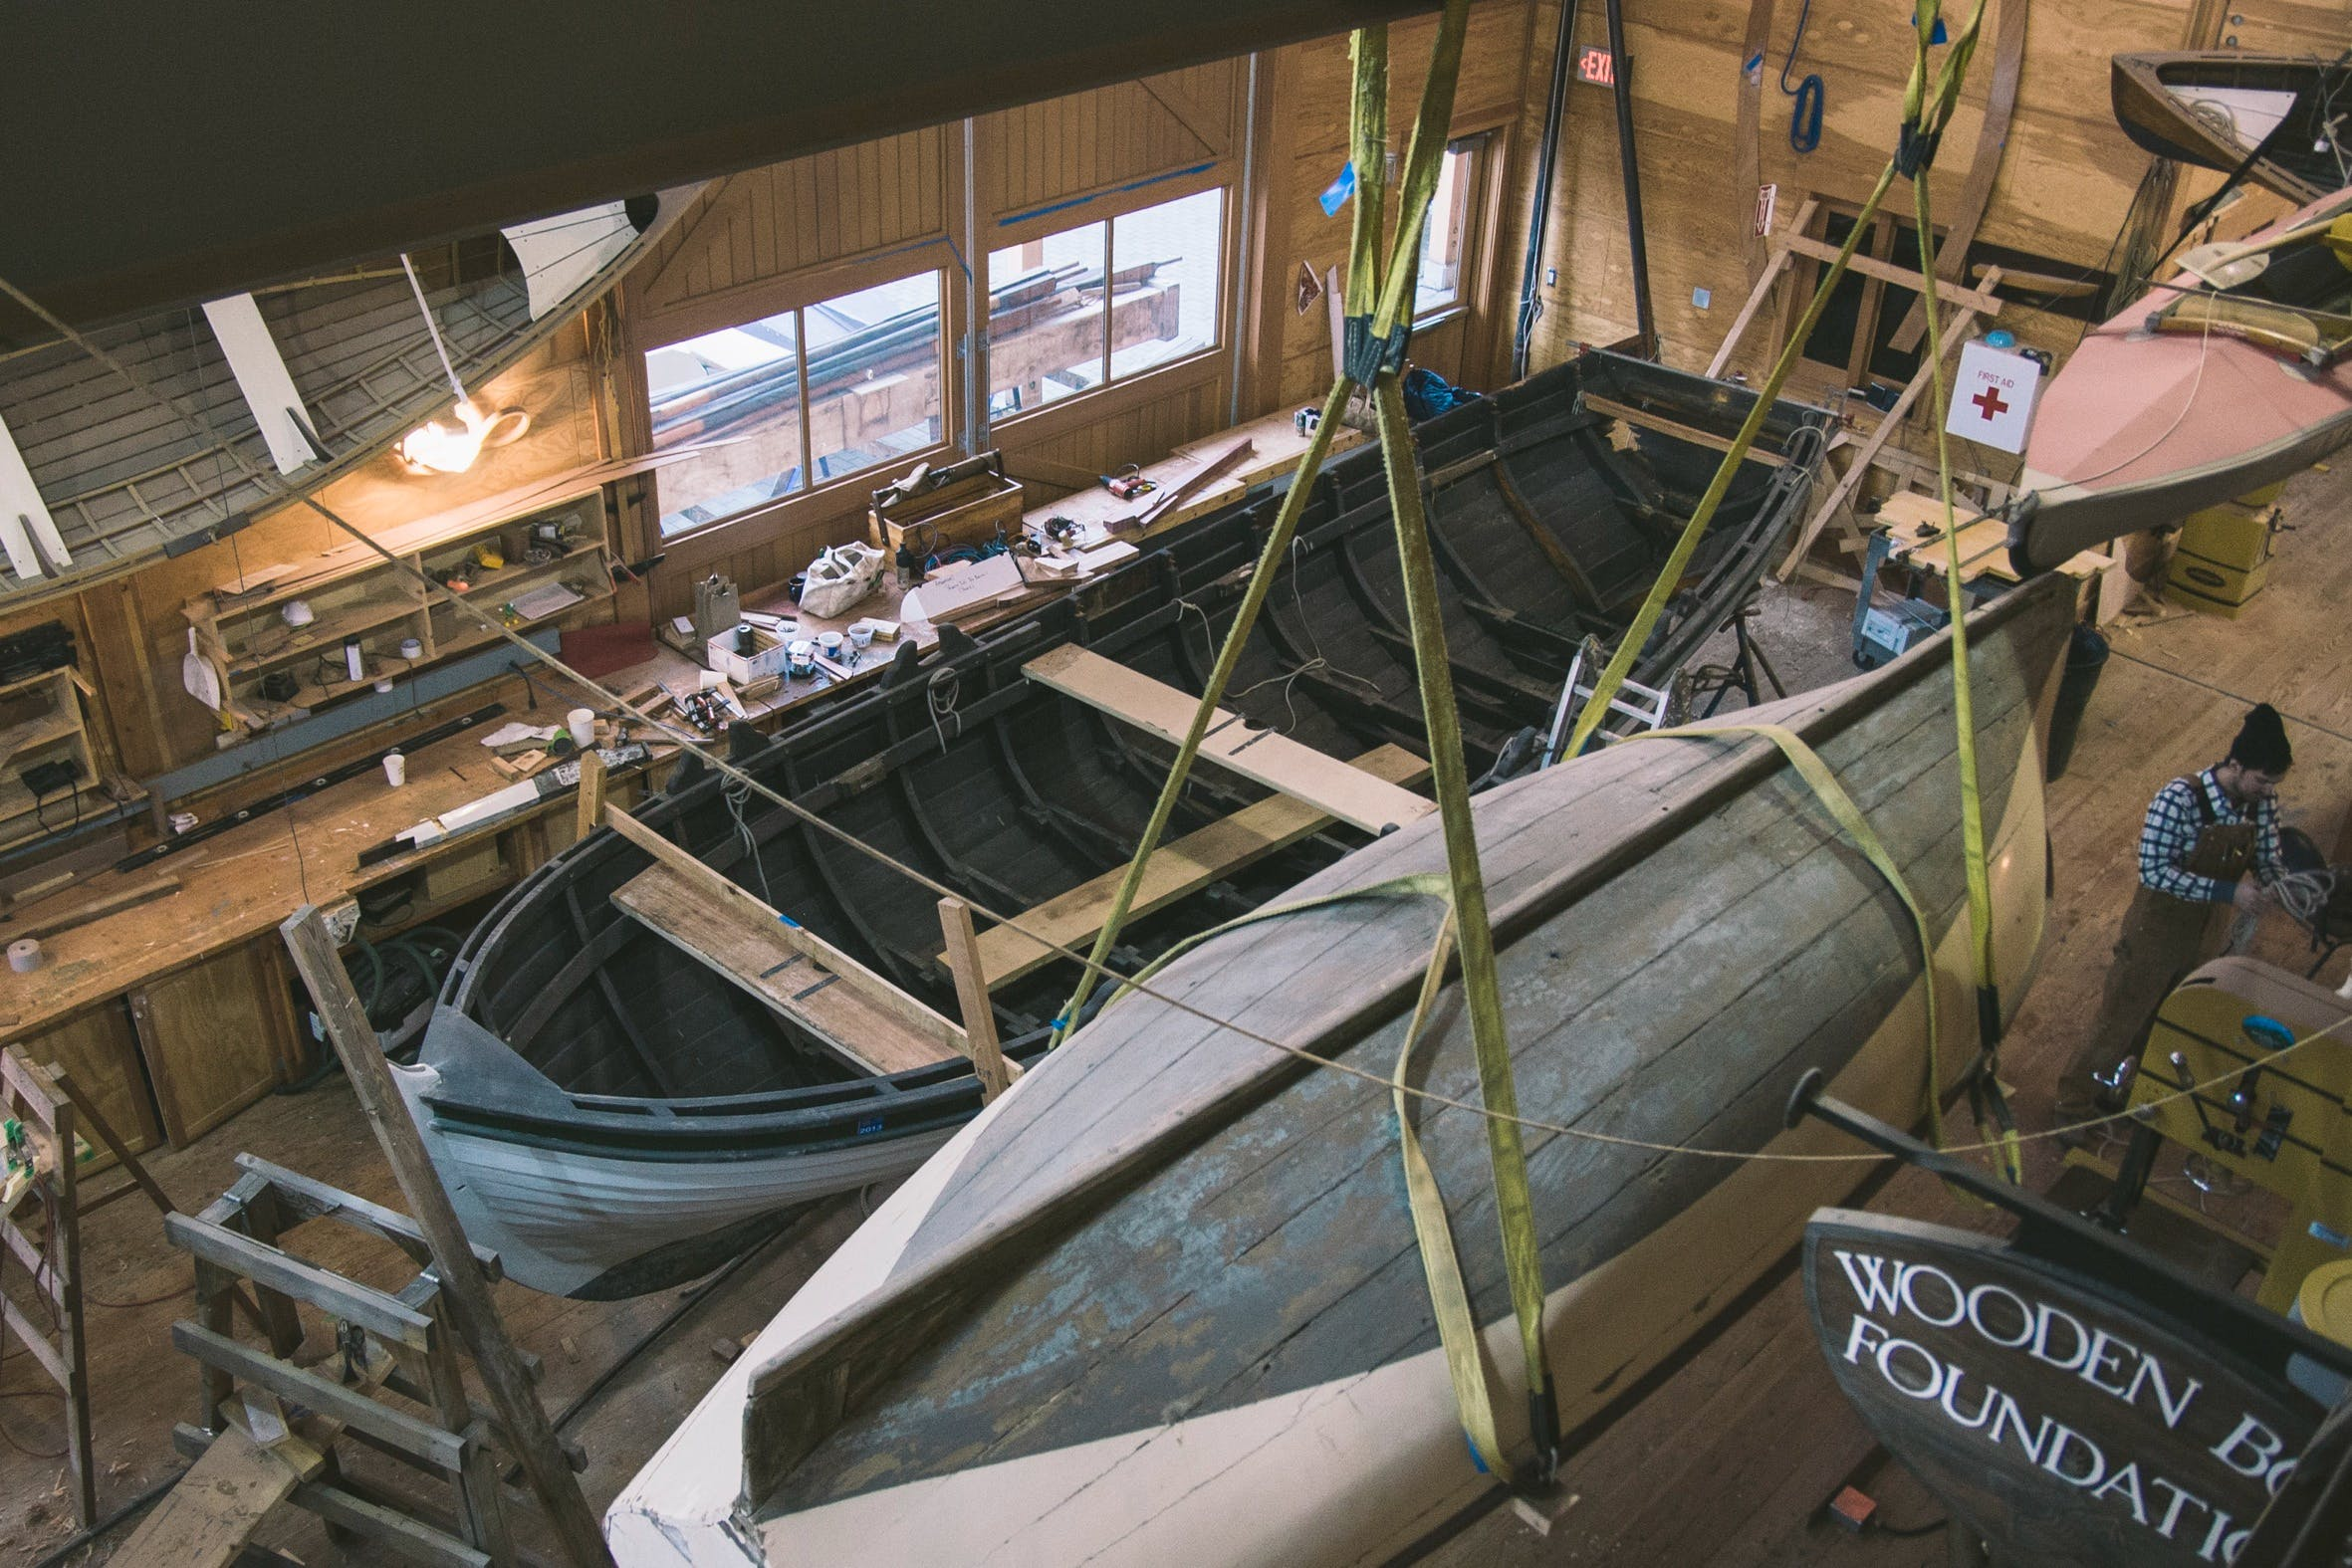 Filson-BoatBuilding-PNW-1